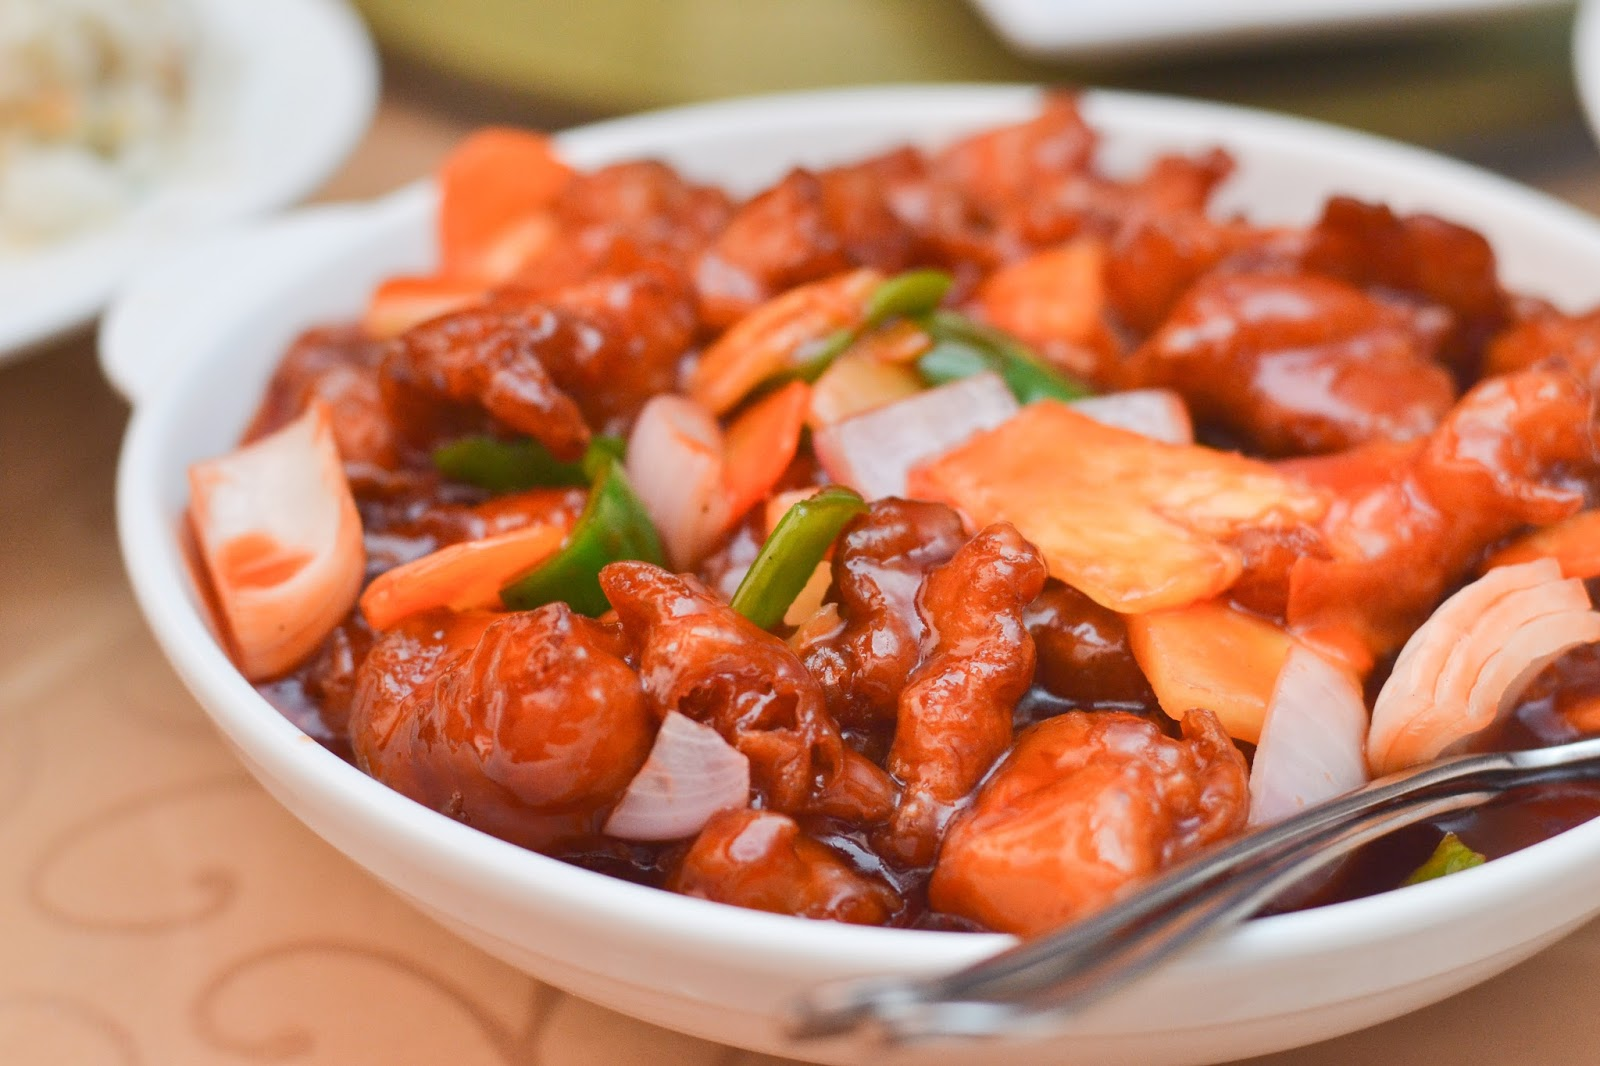 Chinese Sweet & Sour Chicken in Nigeria